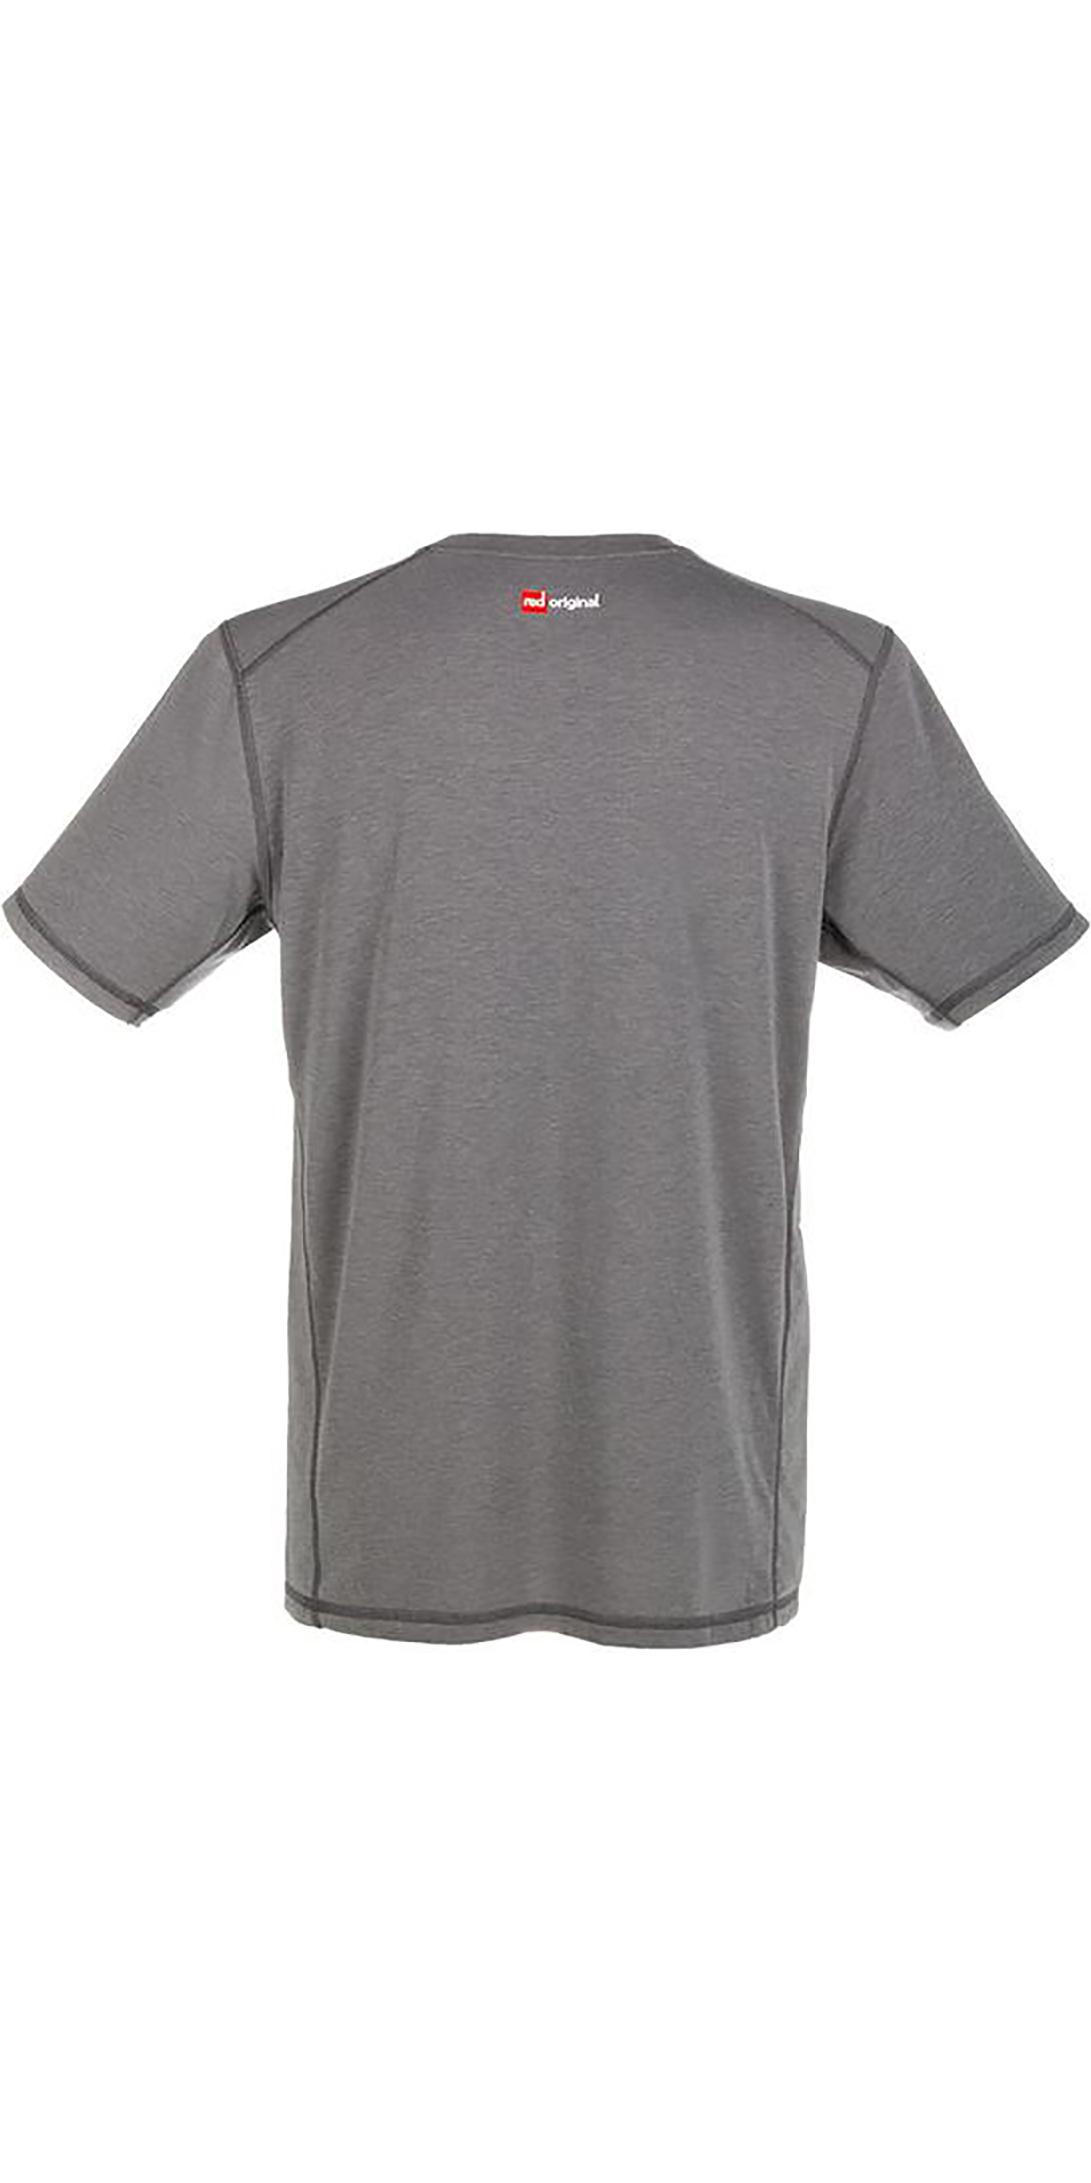 2019 Red Paddle Co Original Dos Homens Performance T-shirt Cinza